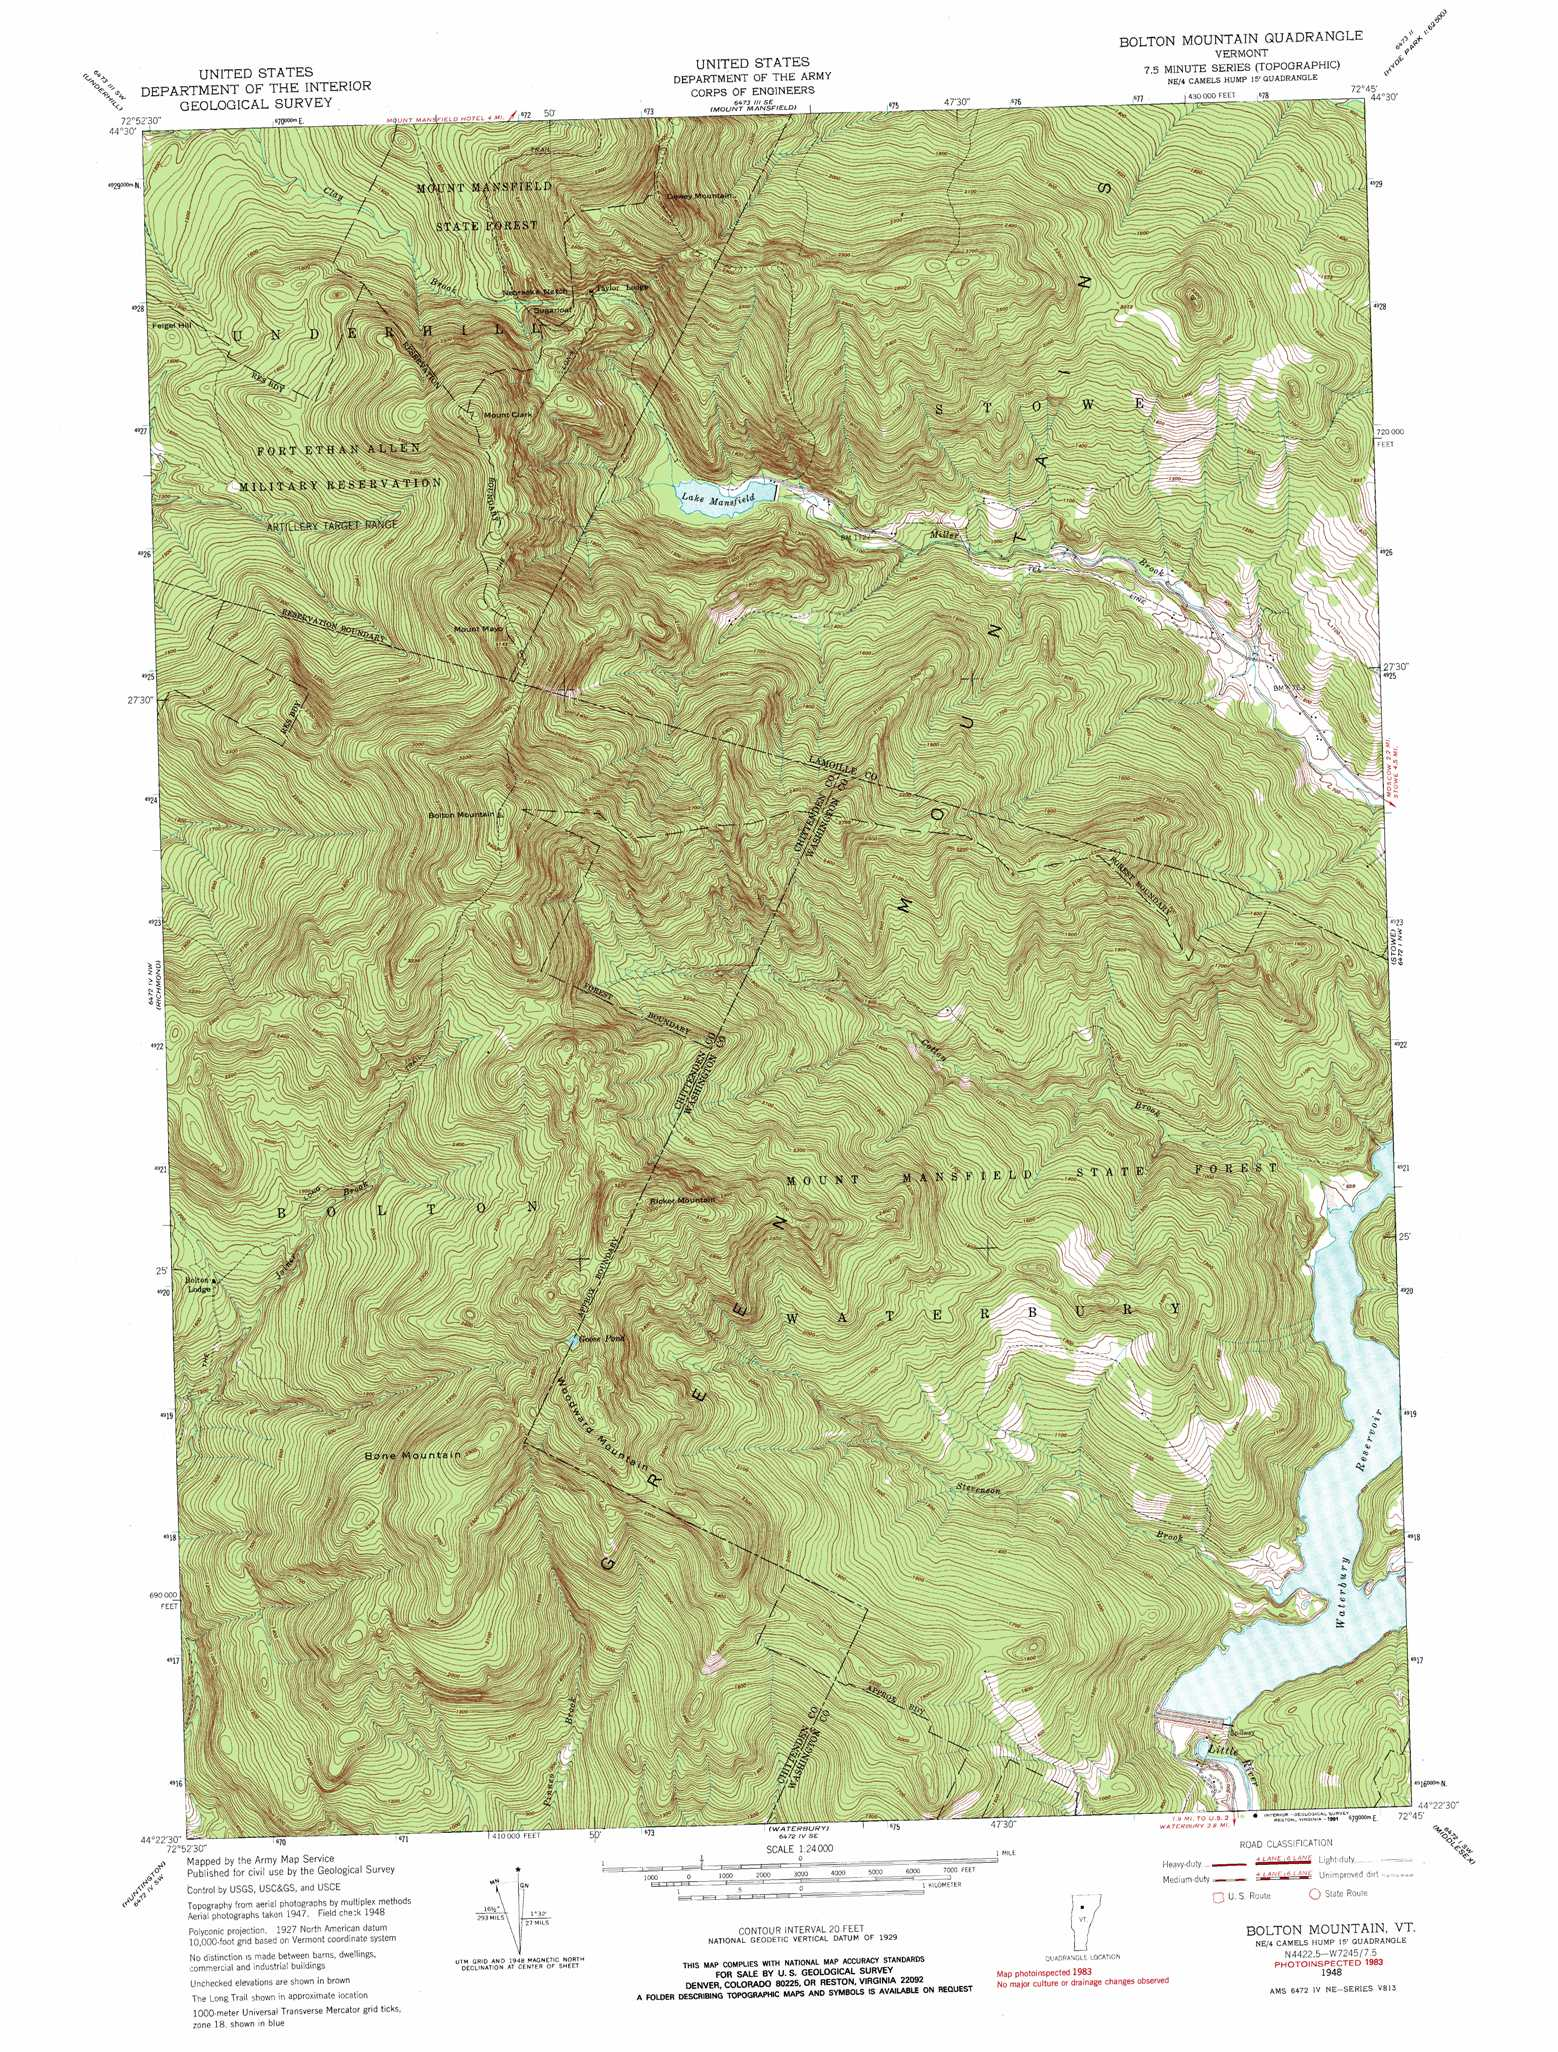 Bolton Mountain topographic map, VT - USGS Topo Quad 44072d7